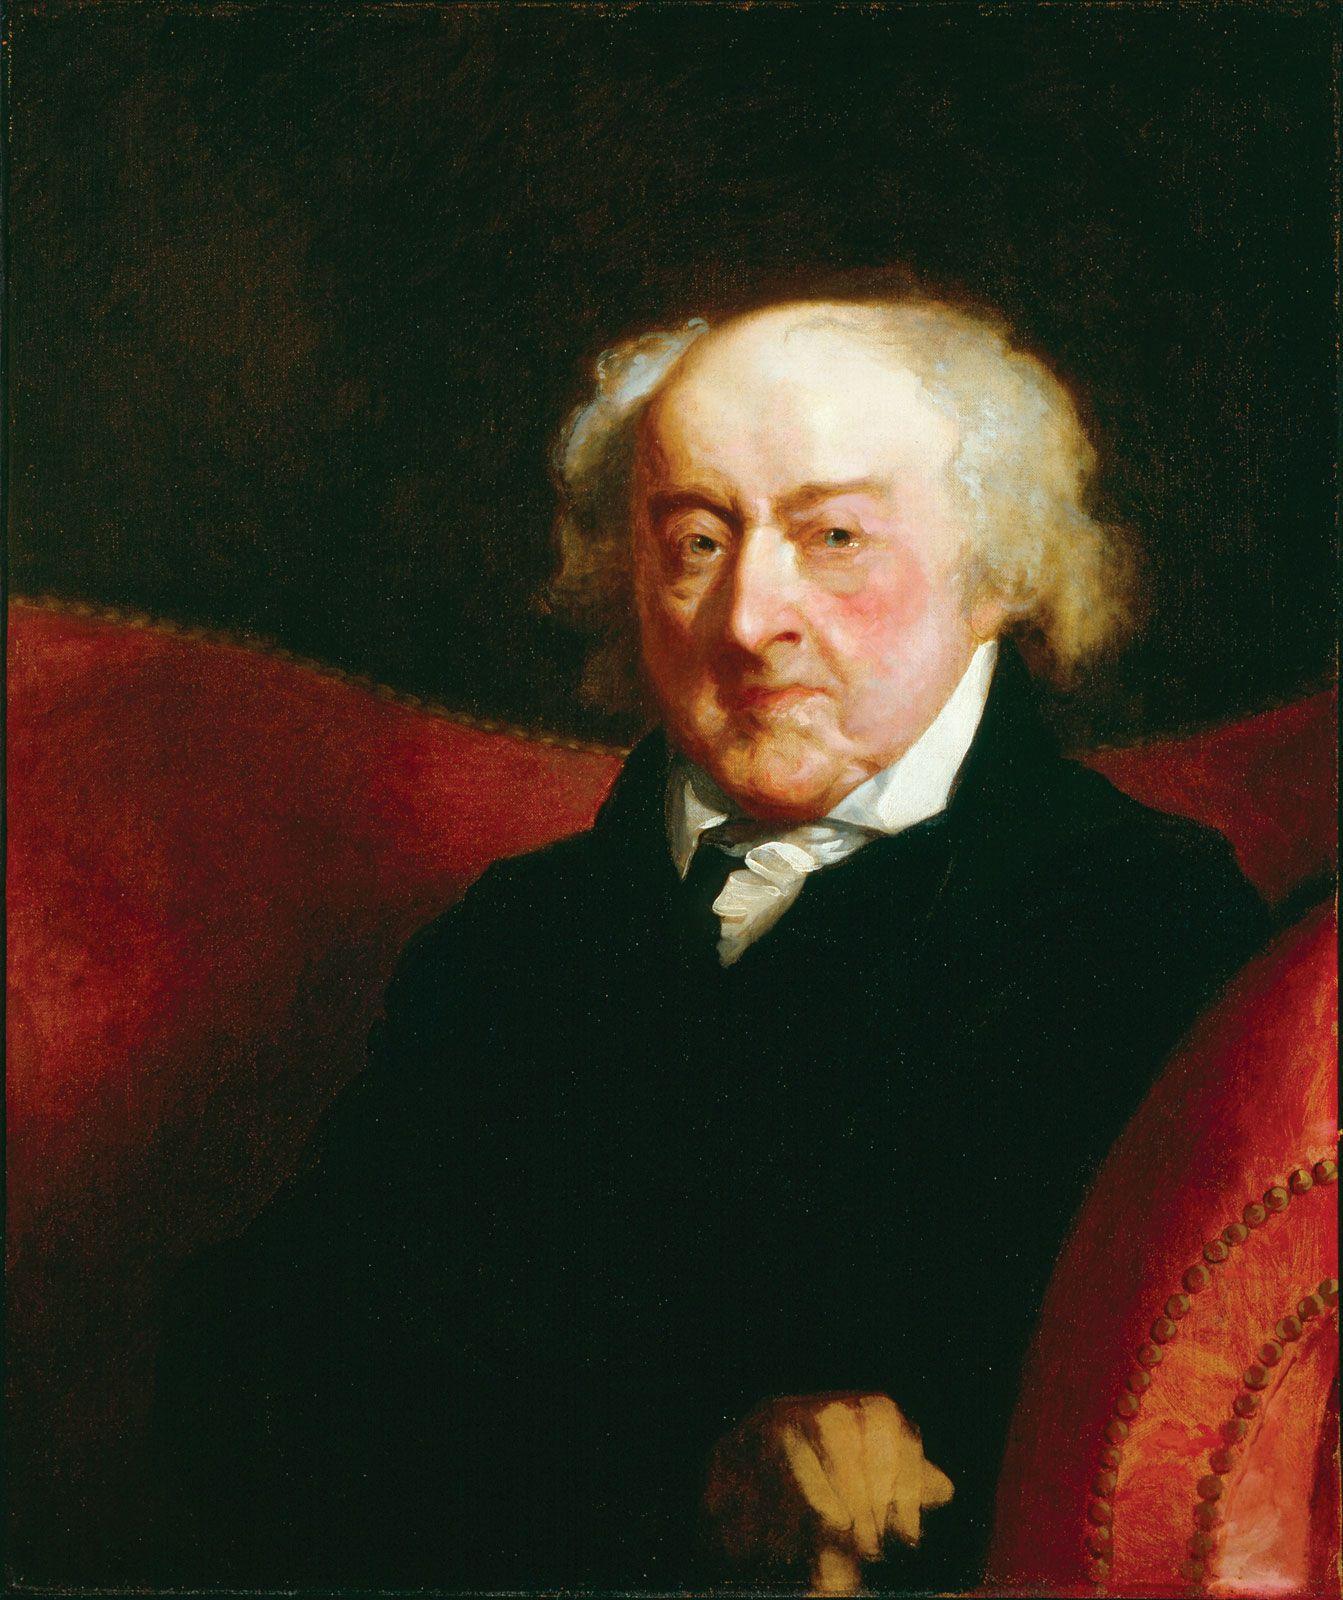 Quotes About George Washington By John Adams: John Adams # 2 By Gilbert Stuart, 1826